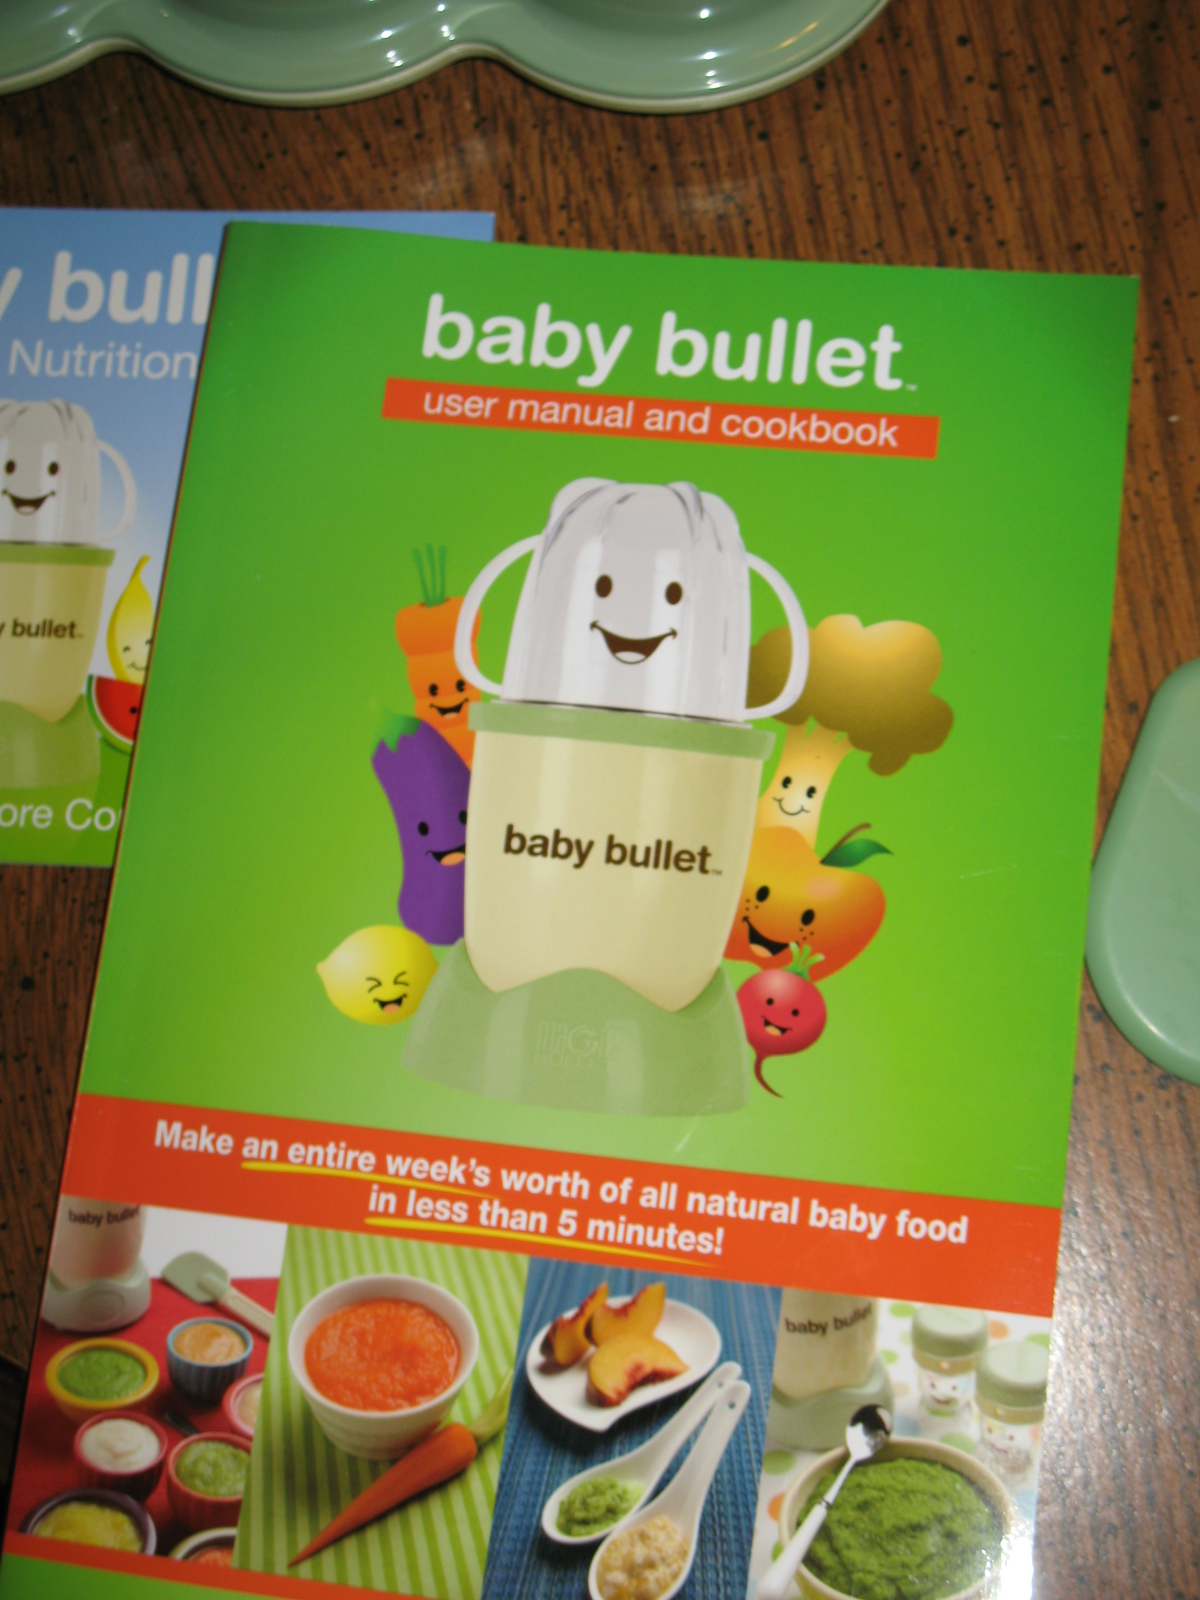 review magic bullet baby bullet central minnesota mom rh centralmnmom com Safety First Walker Instruction Manual baby bullet user manual and cookbook pdf